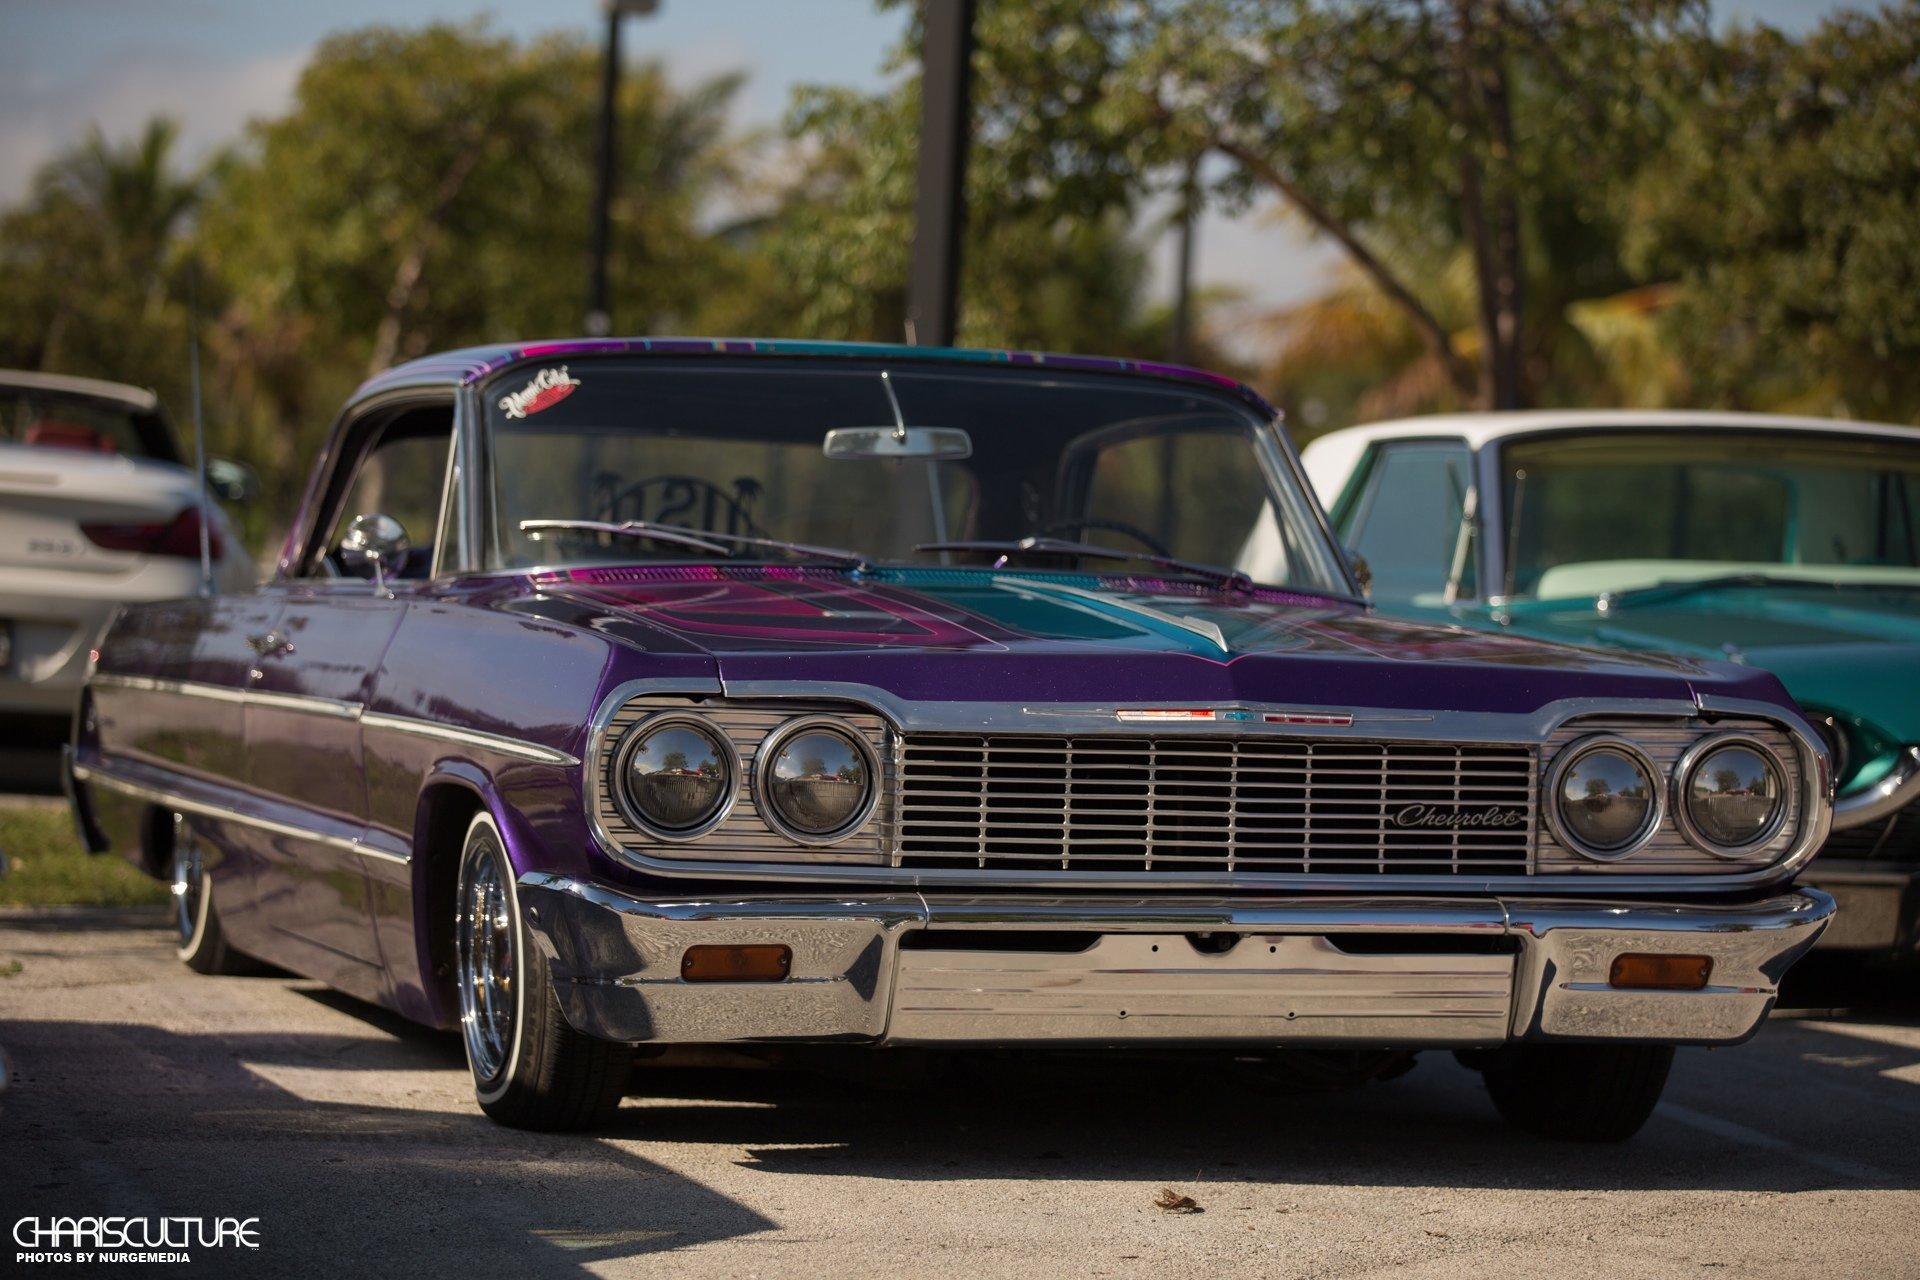 1964 Impala Lowrider Wallpaper - WallpaperSafari